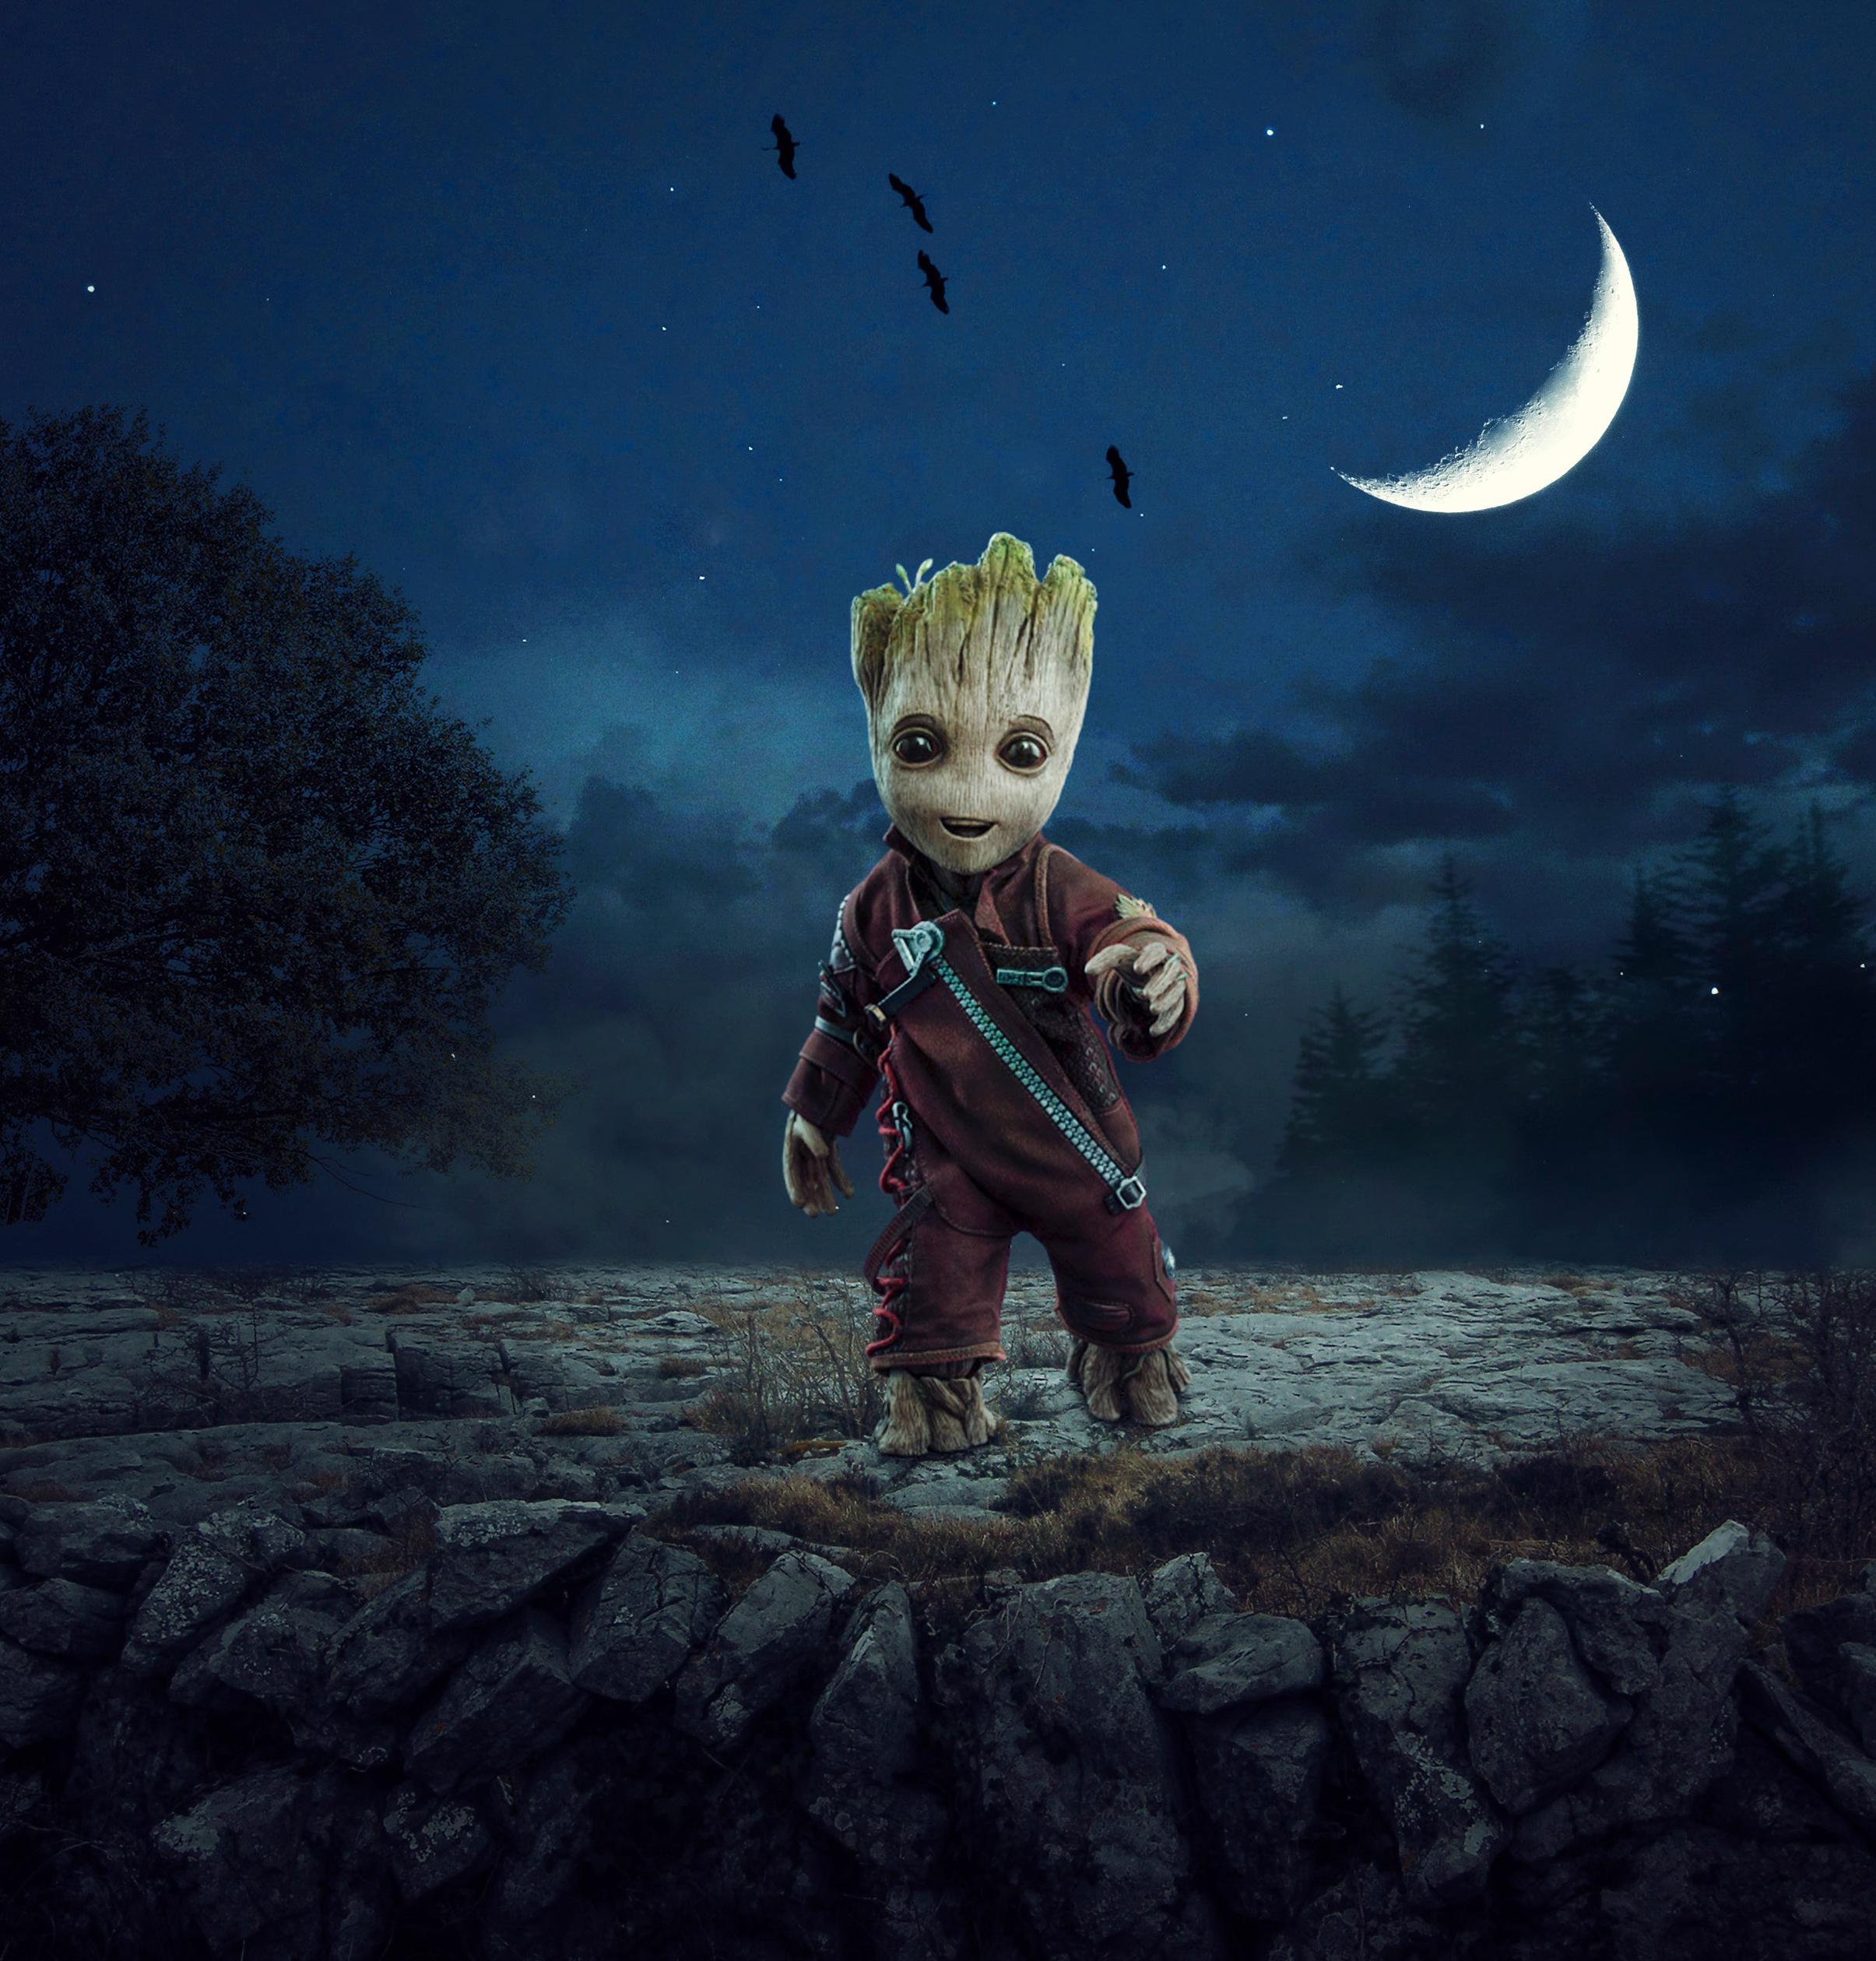 Baby Groot Wallpaper, HD Artist 4K Wallpapers, Images ...